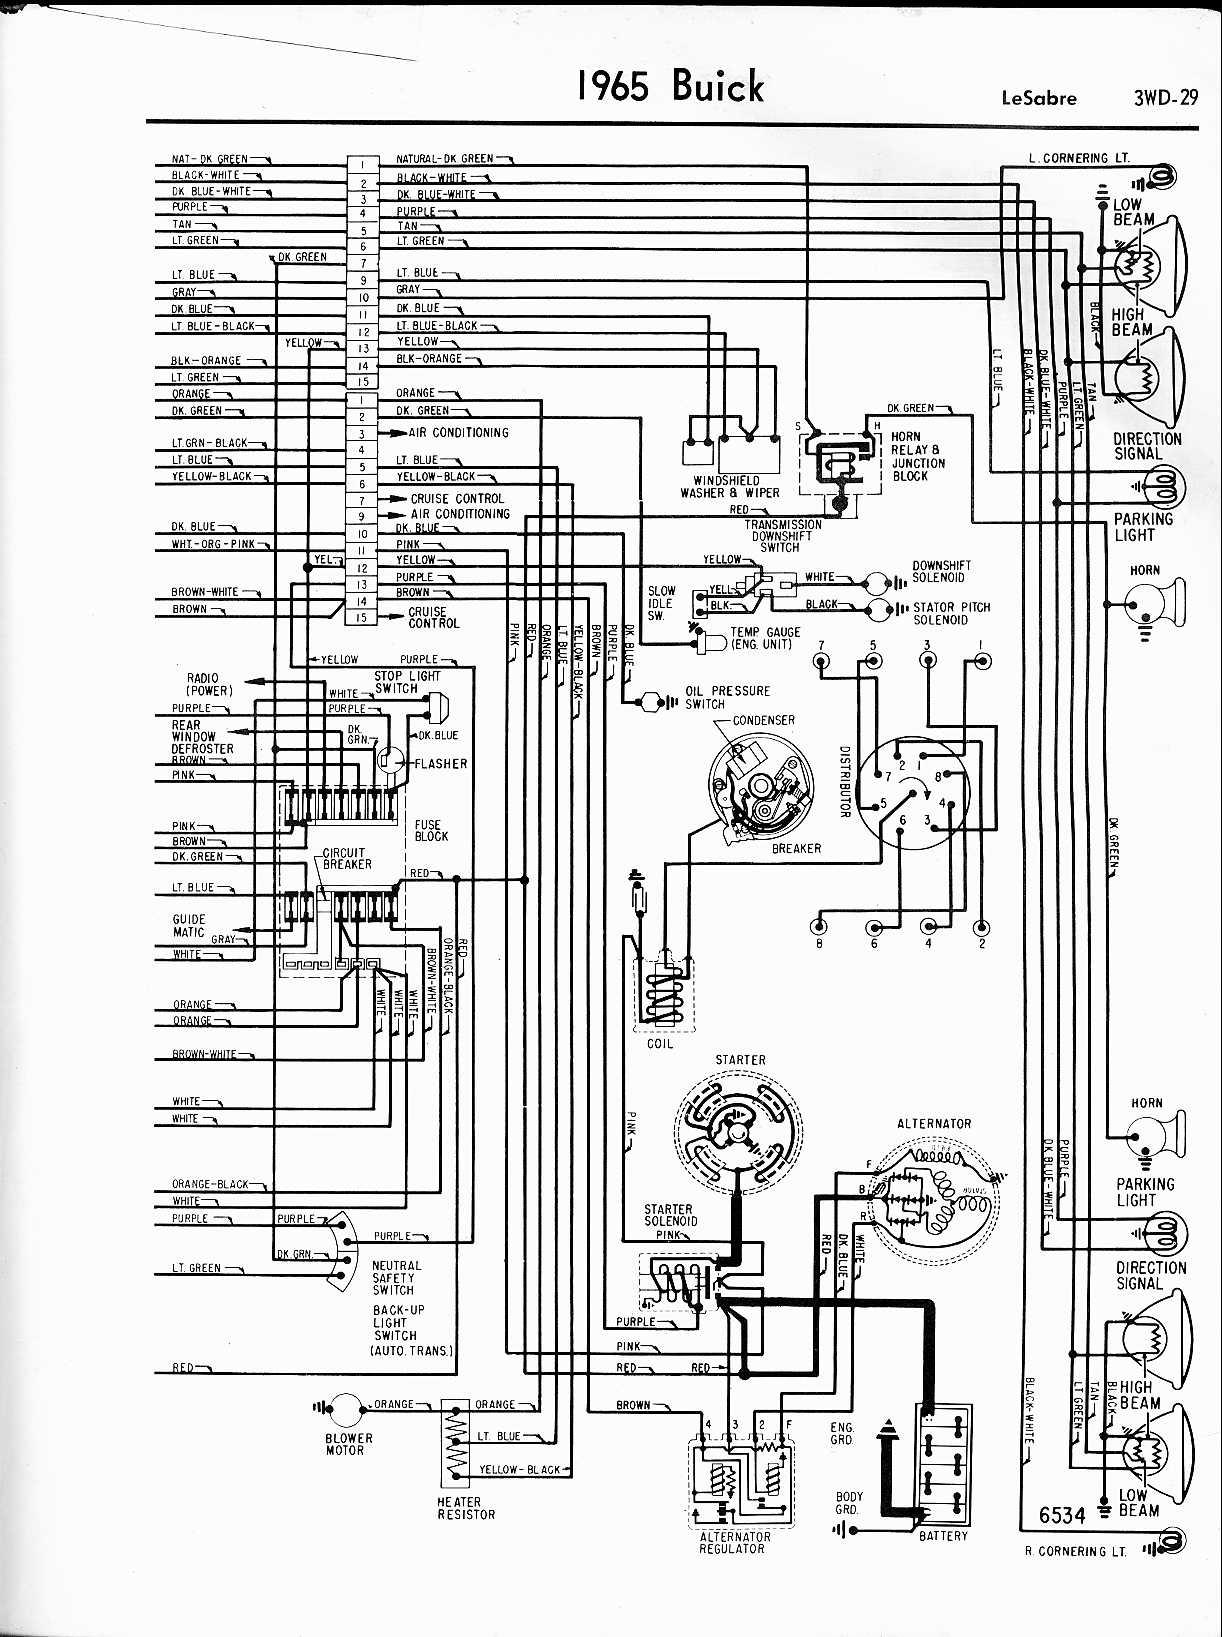 Zg Olds Intrigue Engine Diagram Wiring Diagram